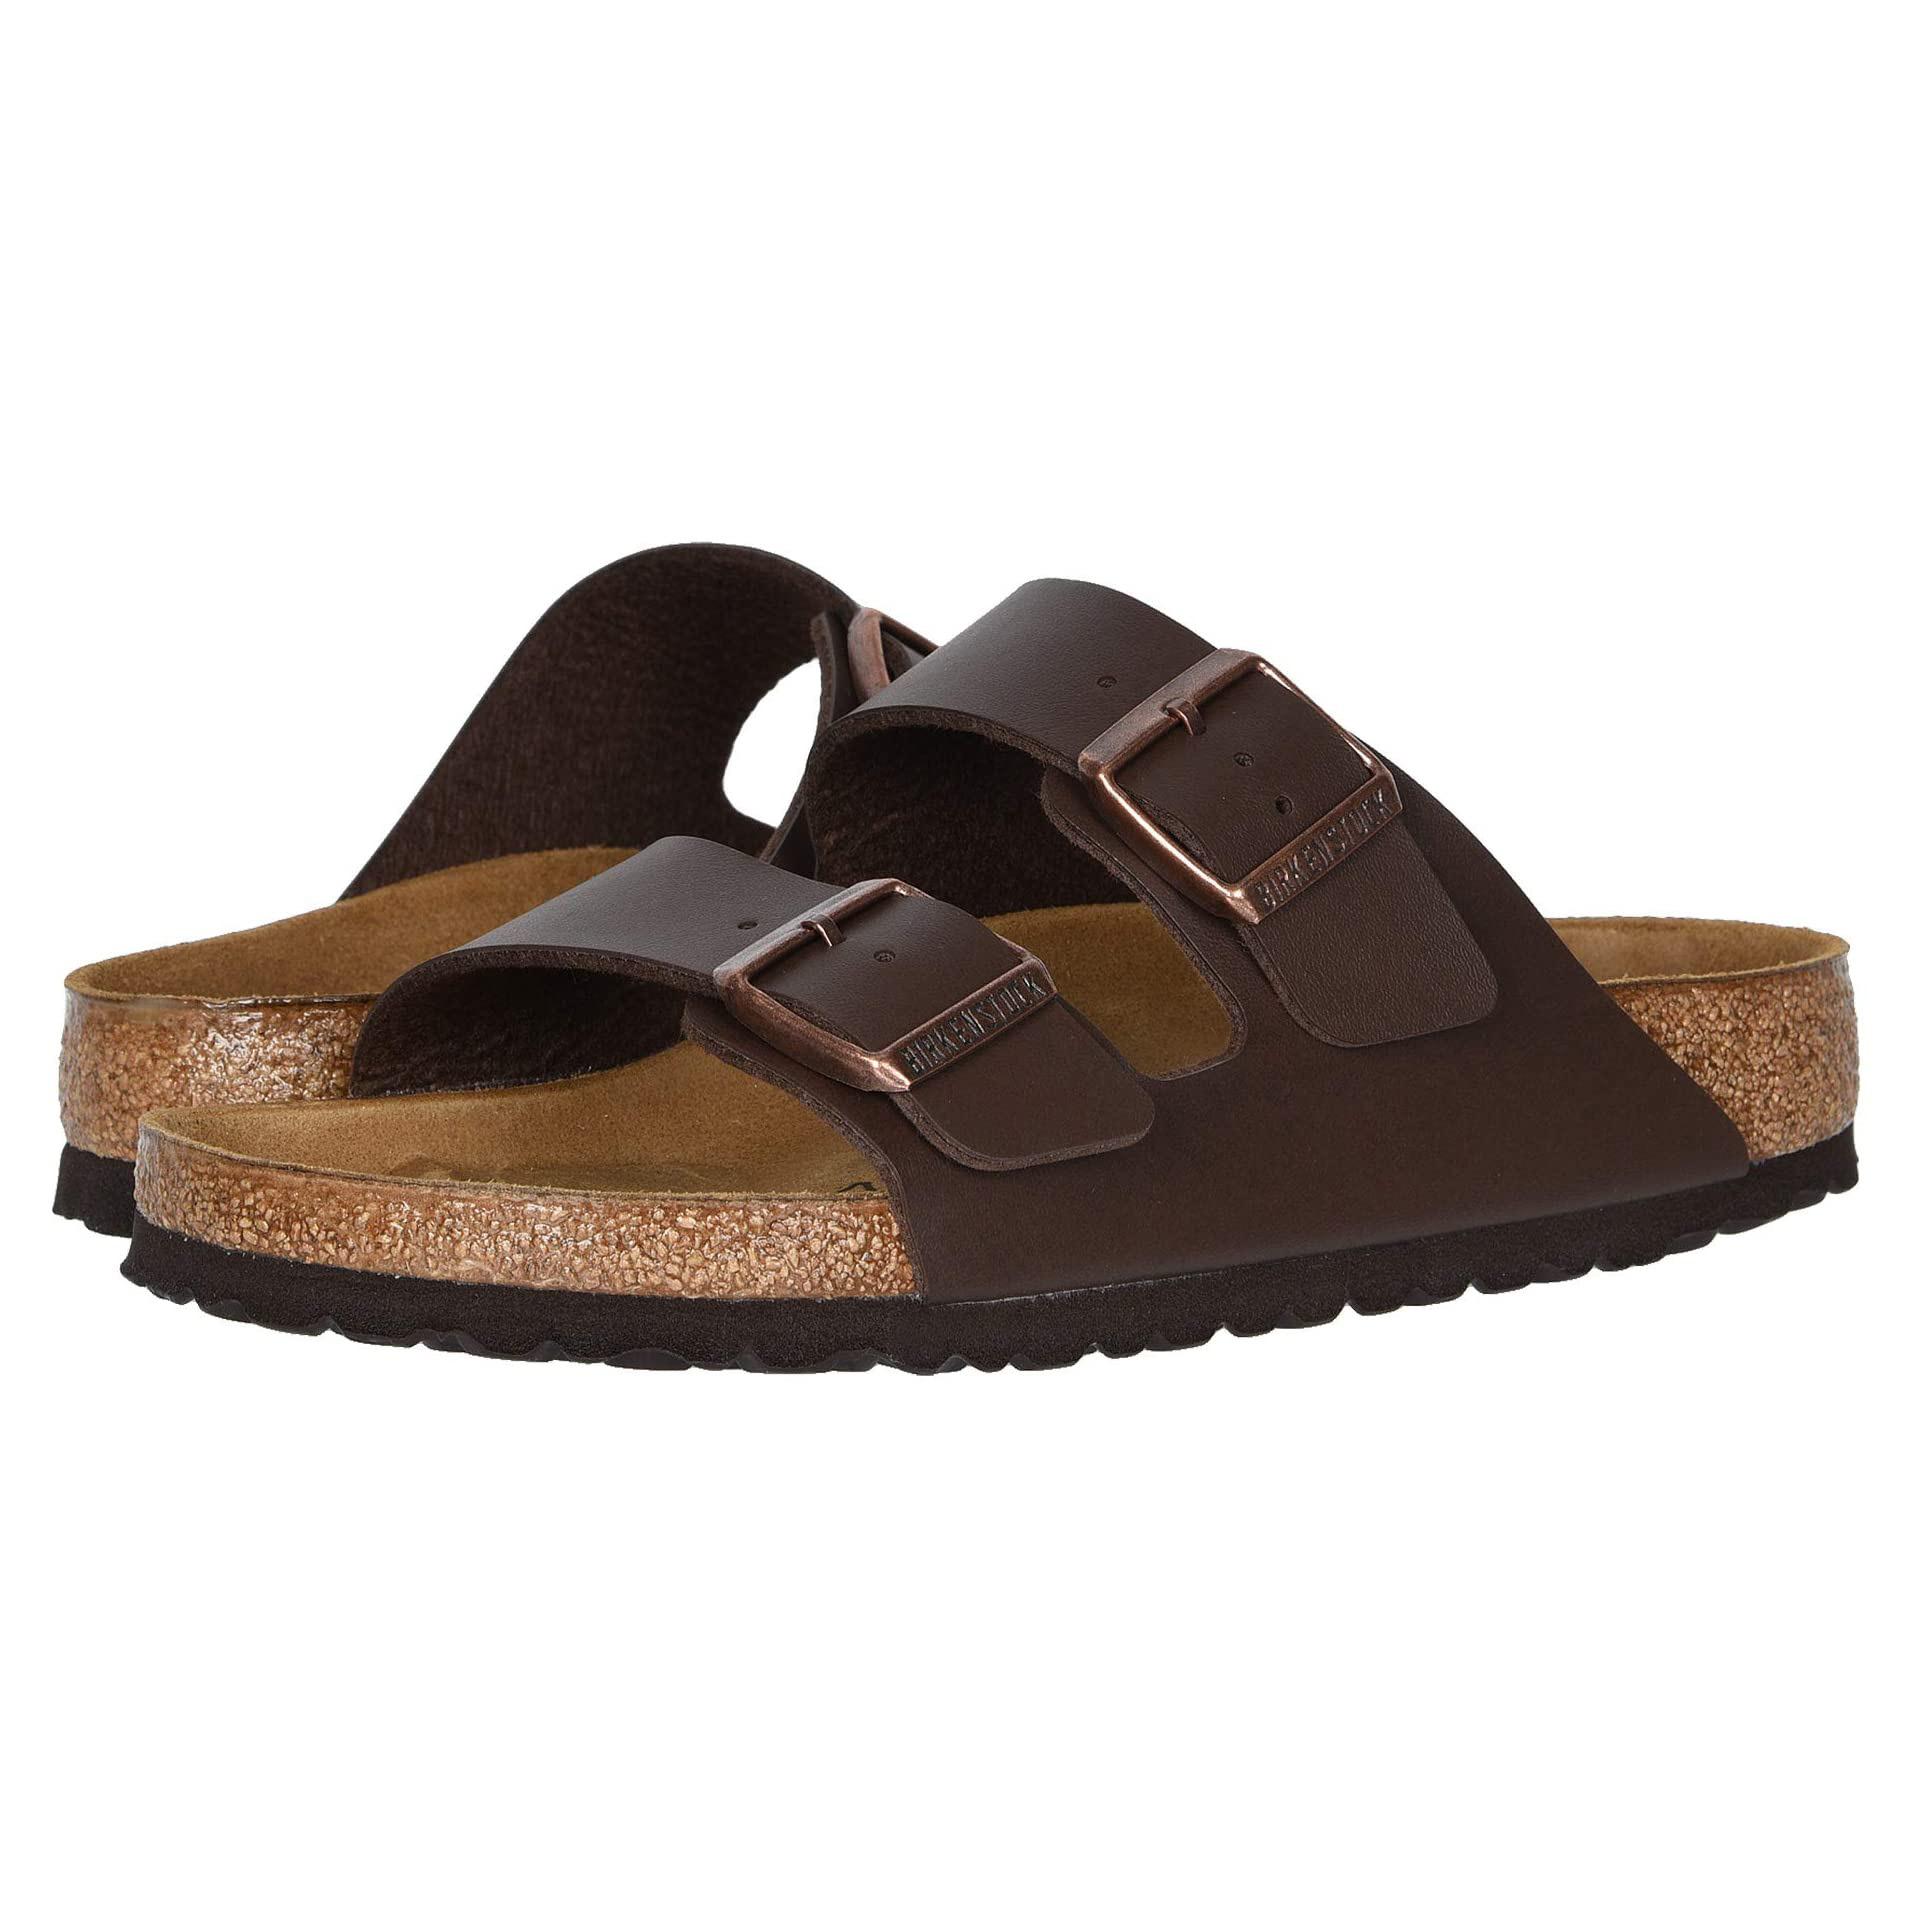 Birkenstock Arizona Leather Sandal, men's sandals